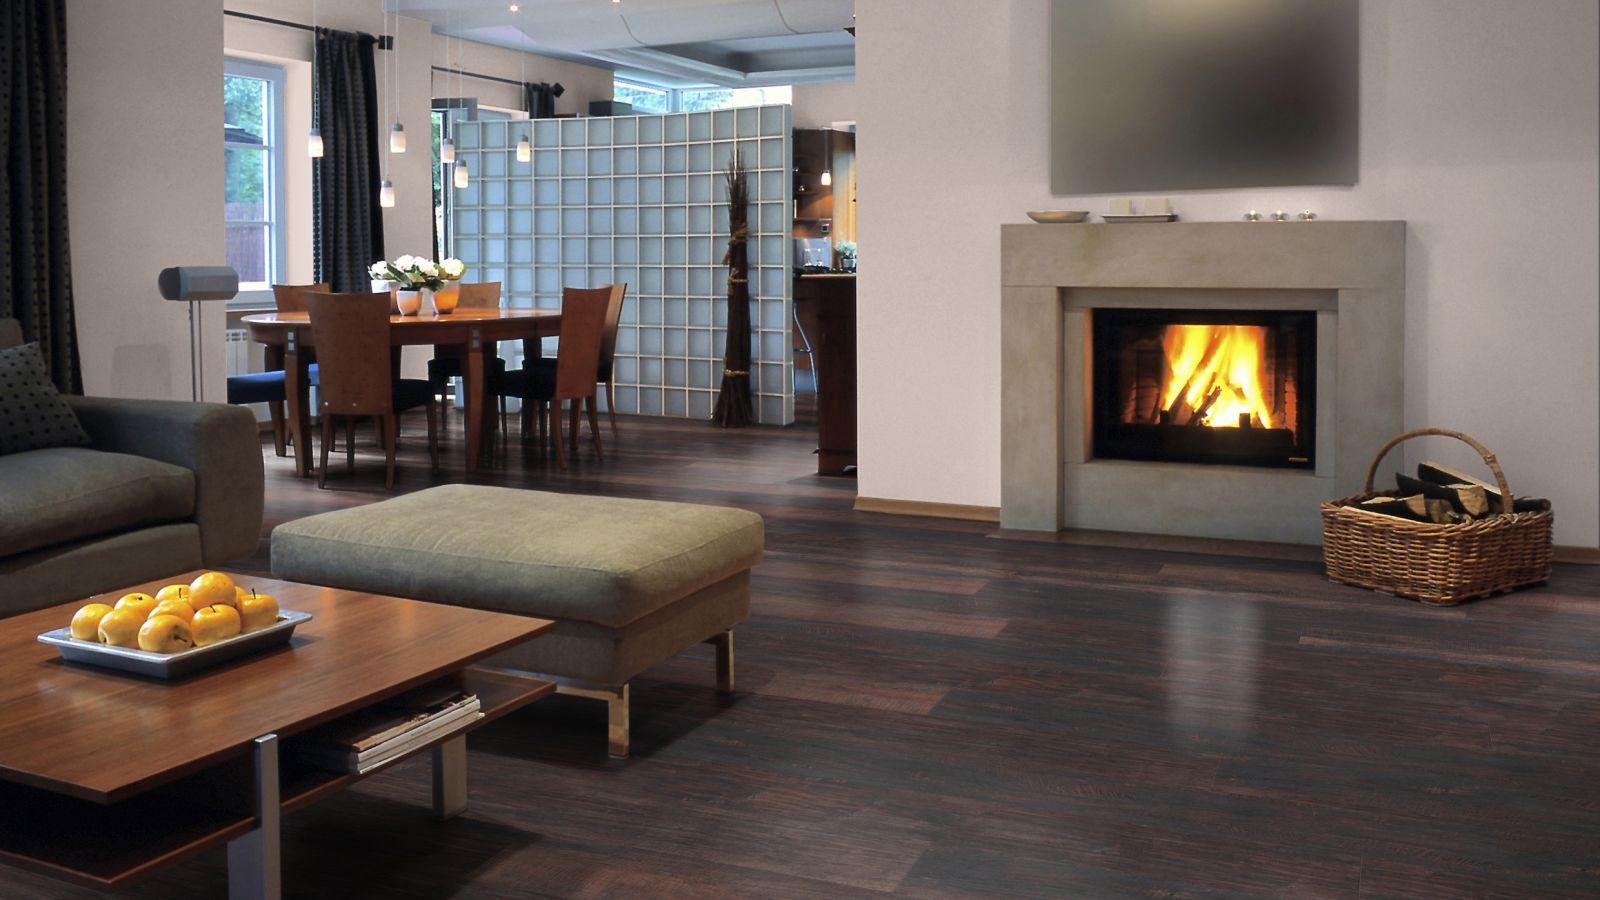 Keuken Badkamer Vloeren : Pvc vloeren mflor mflorshop